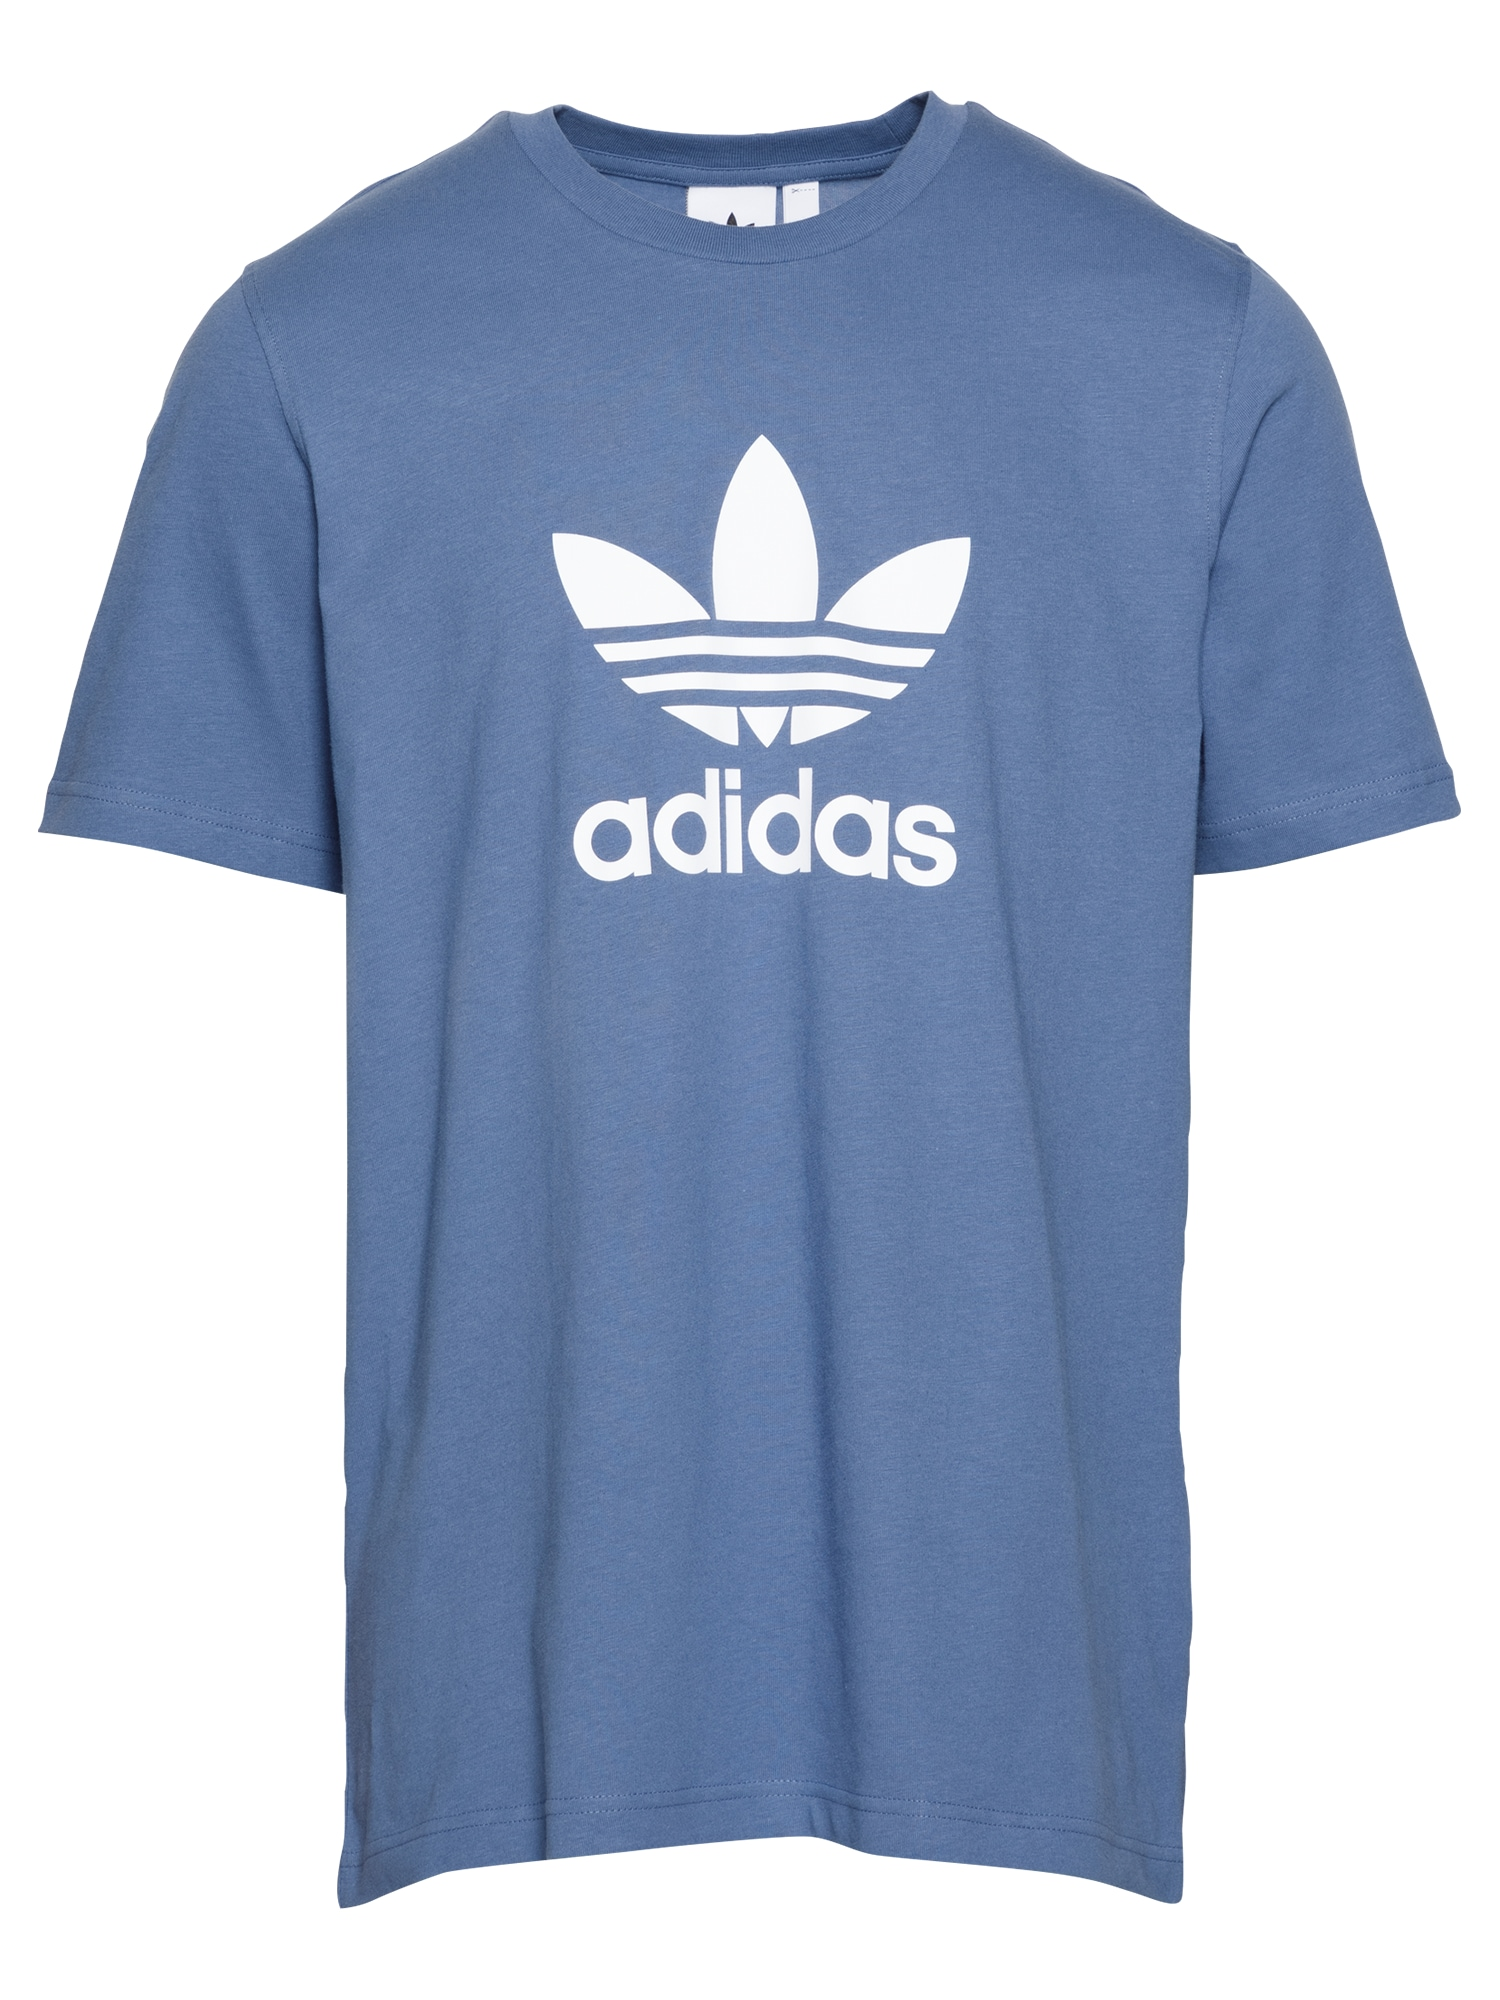 ADIDAS ORIGINALS Marškinėliai mėlyna dūmų spalva / balta